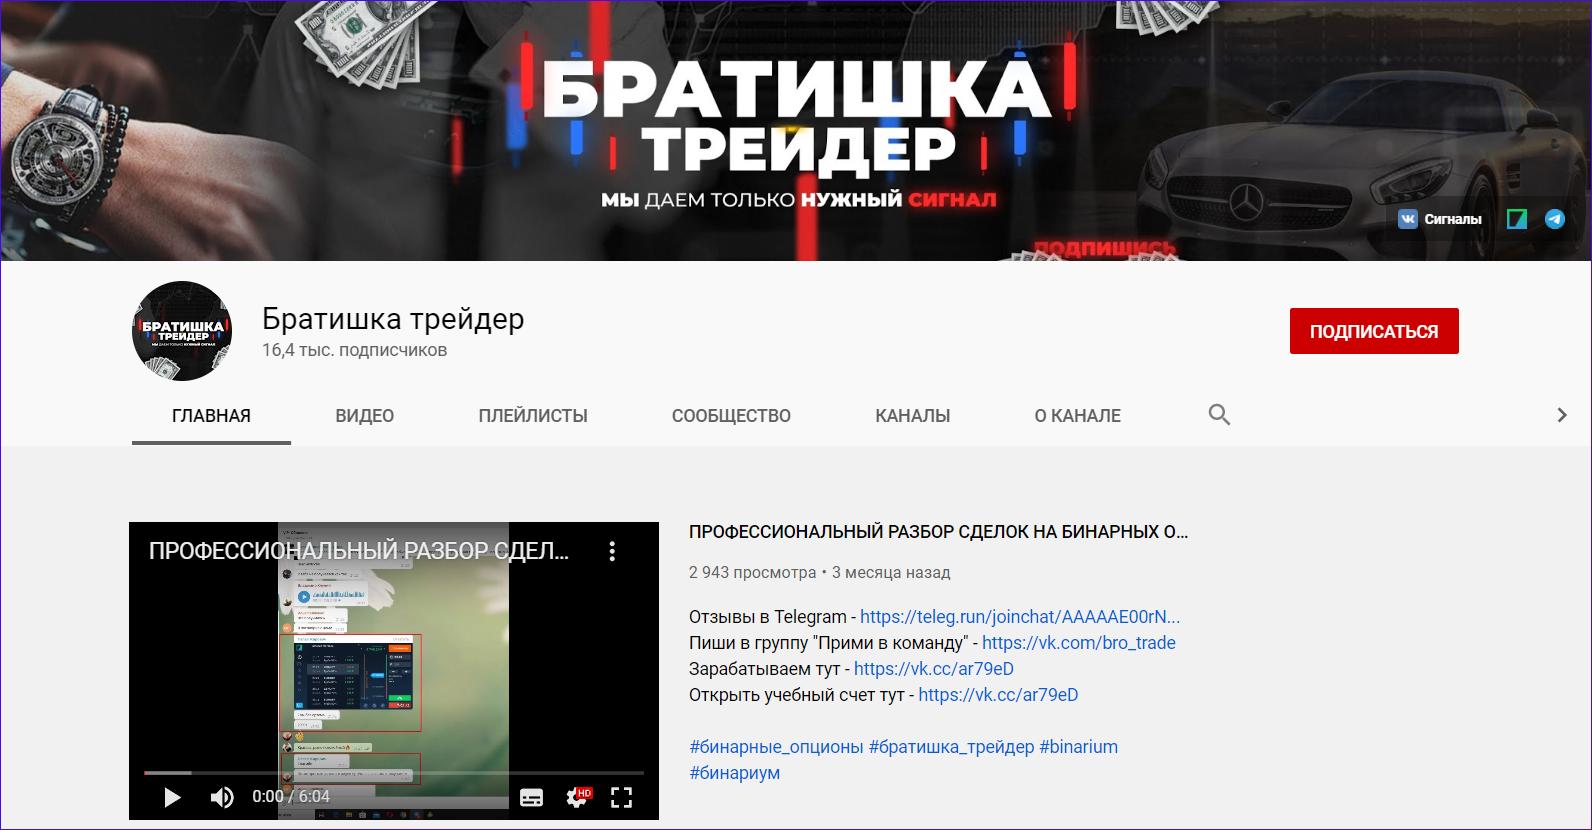 Проект на видеохостинге